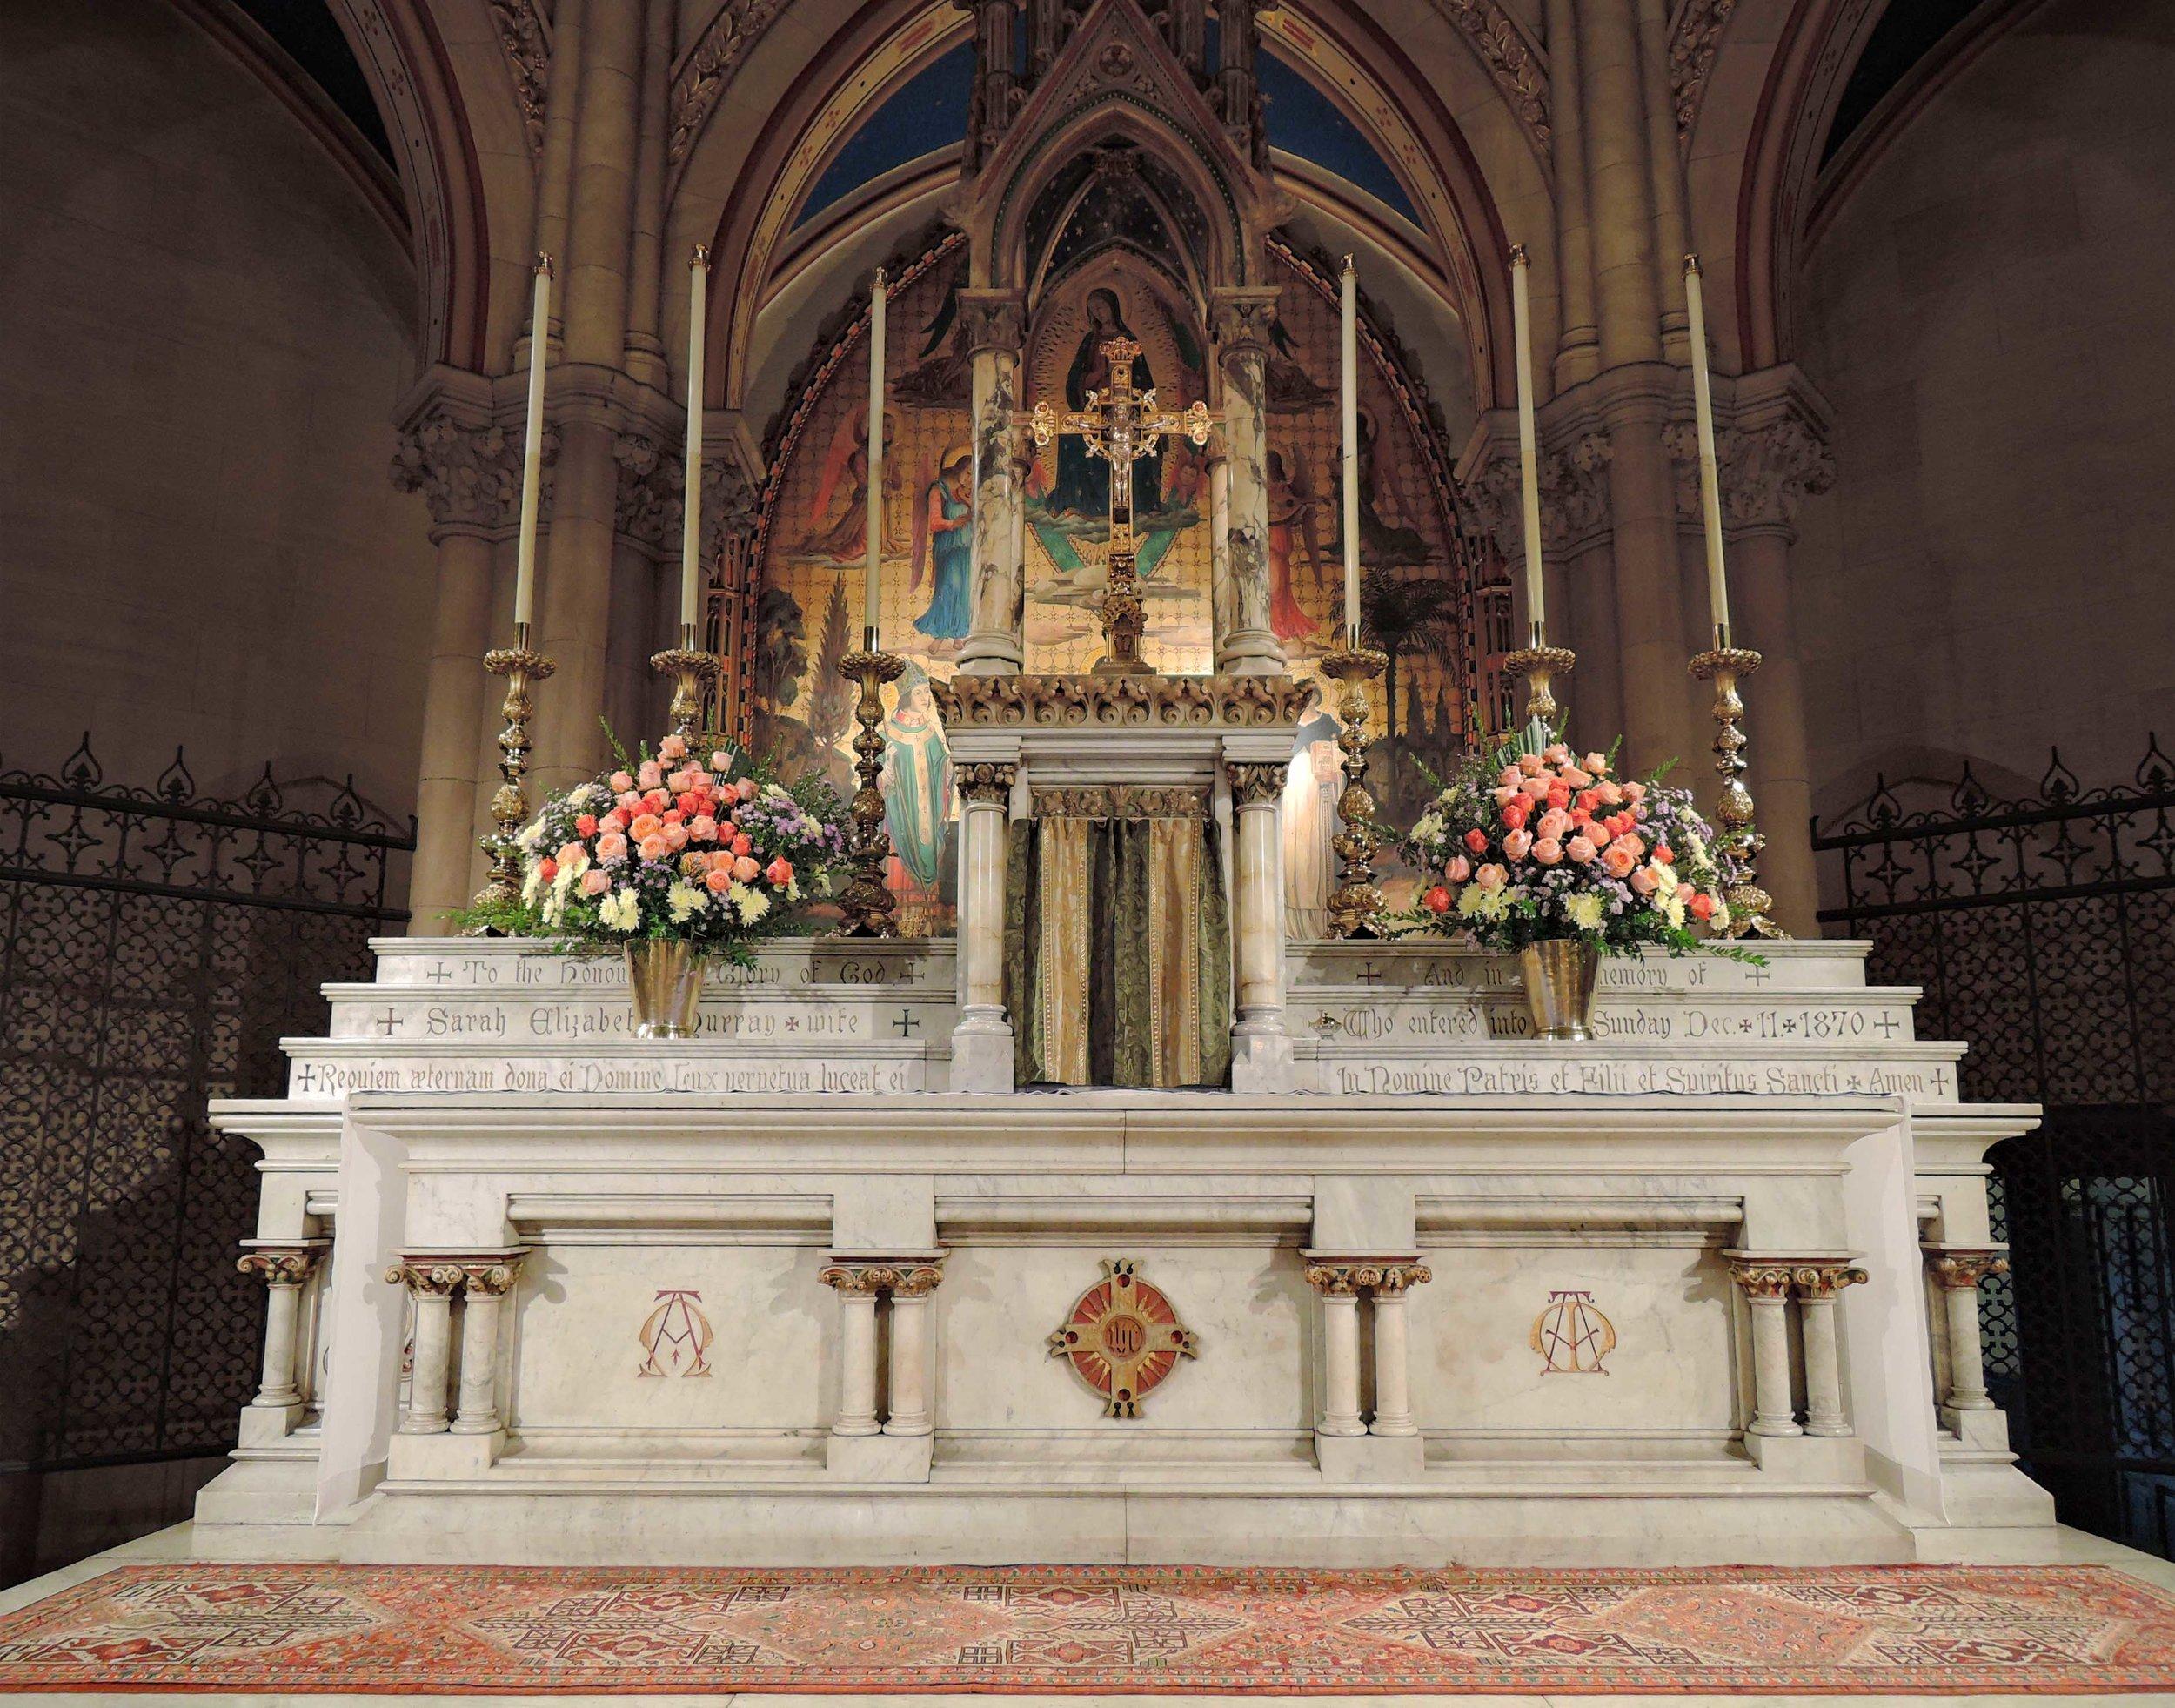 The high altar, Sunday, September 17, 2017.